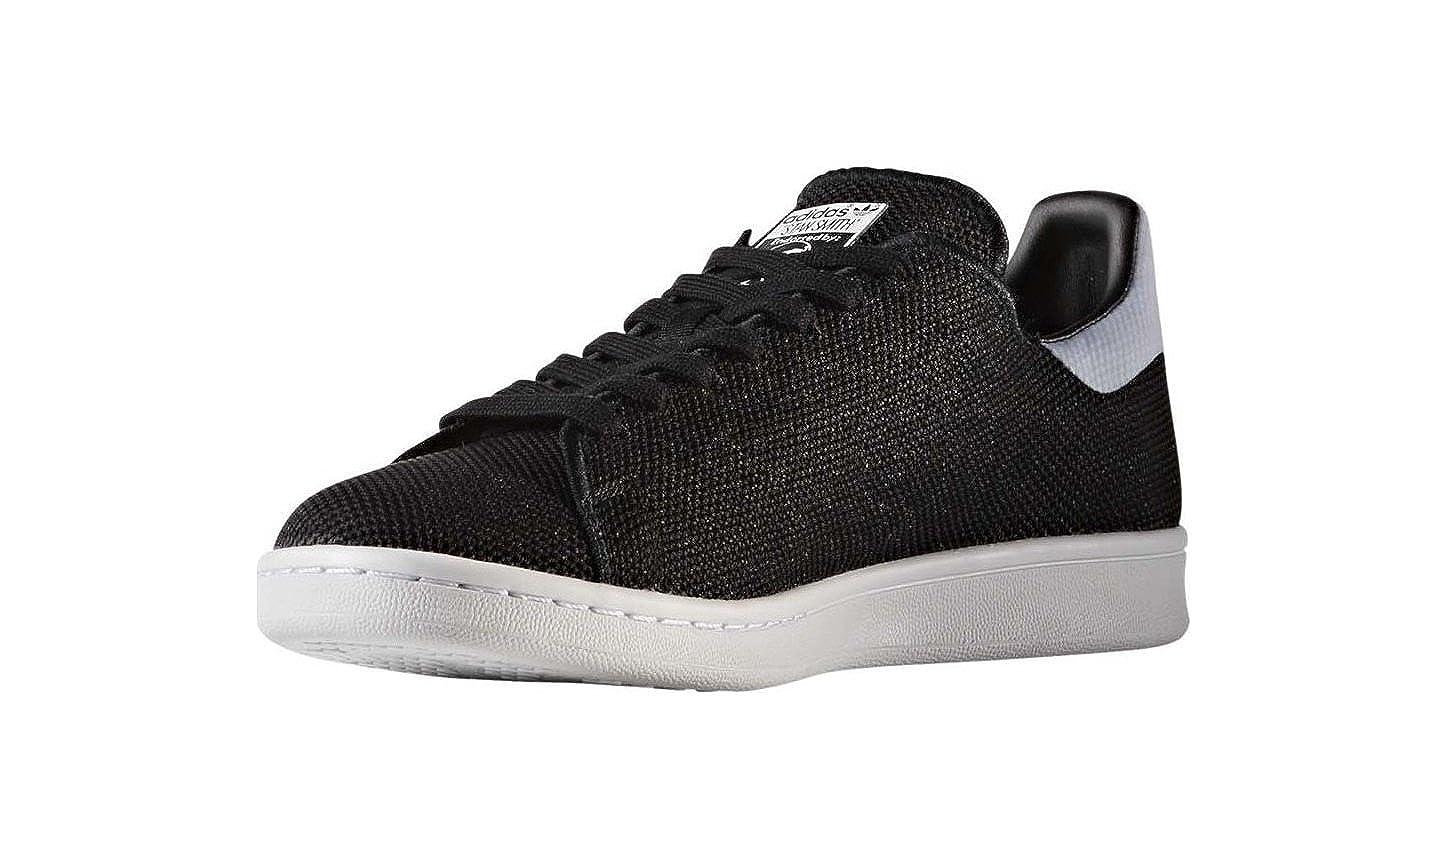 timeless design 341c6 2db45 adidas Stan Smith, Scarpe da Tennis Uomo  Amazon.it  Scarpe e borse